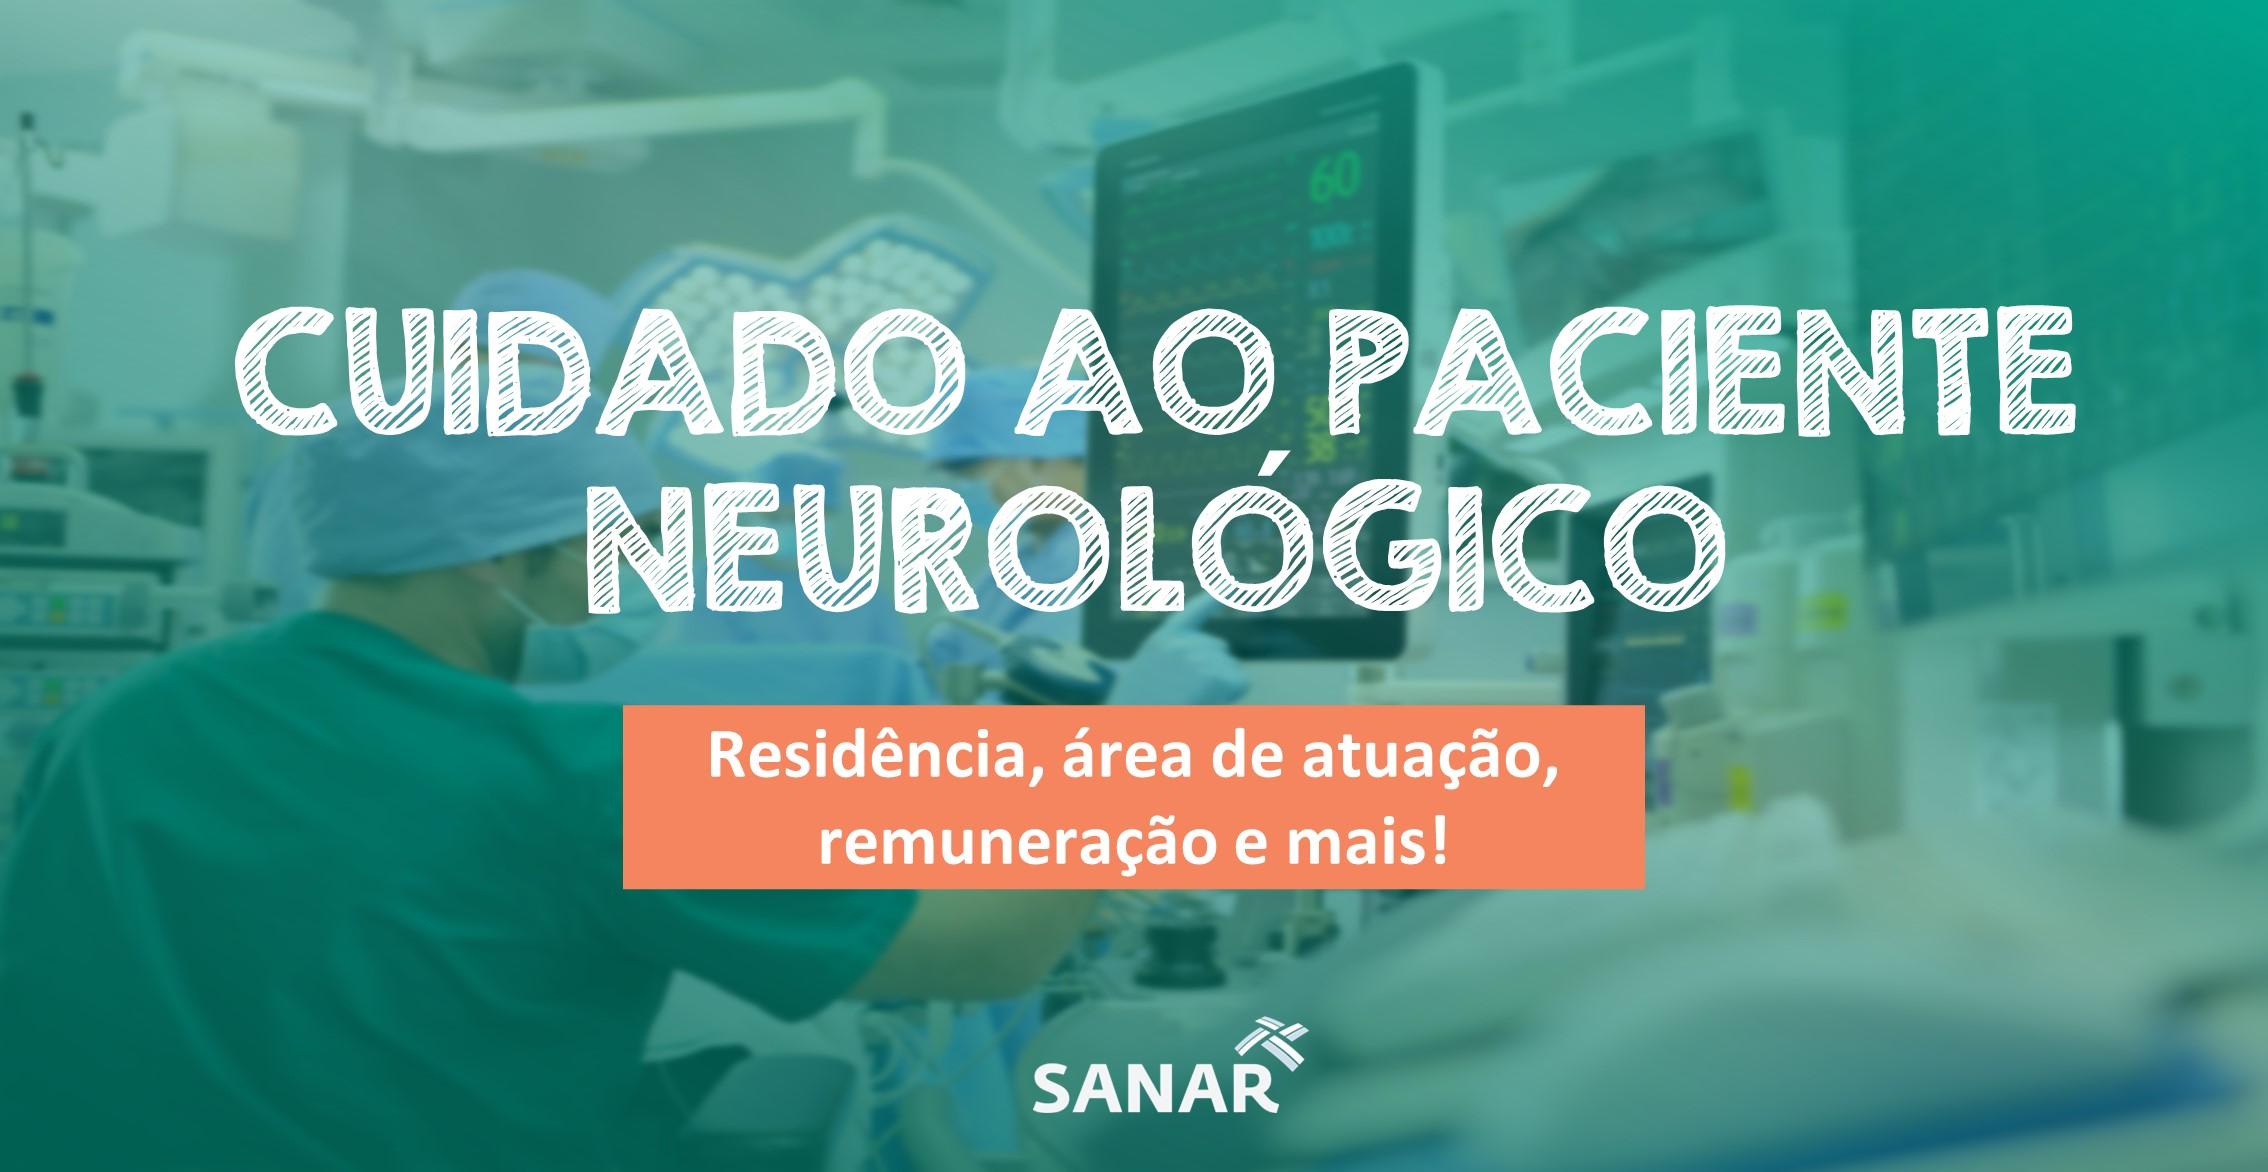 Cuidado ao Paciente Neurológico e Neurocirúgico